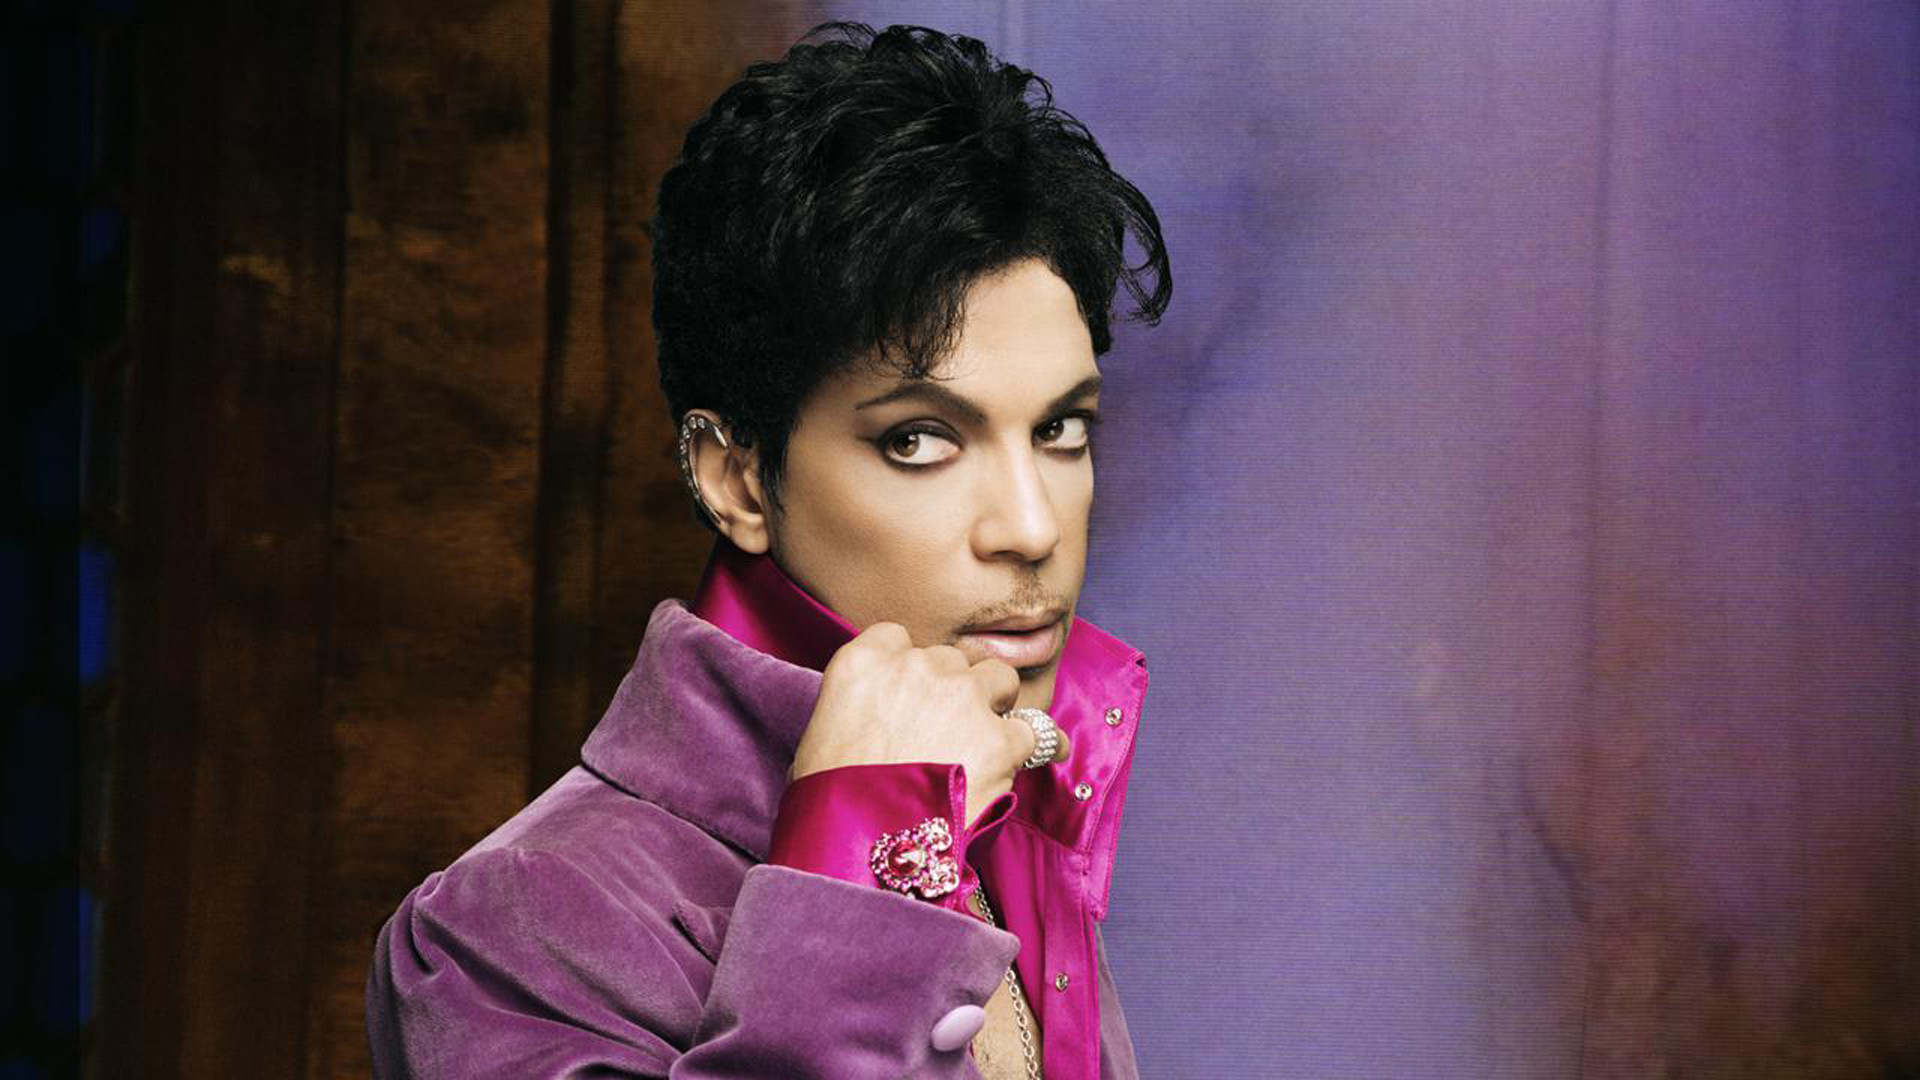 певец принц фото биография свои фото киселёвска